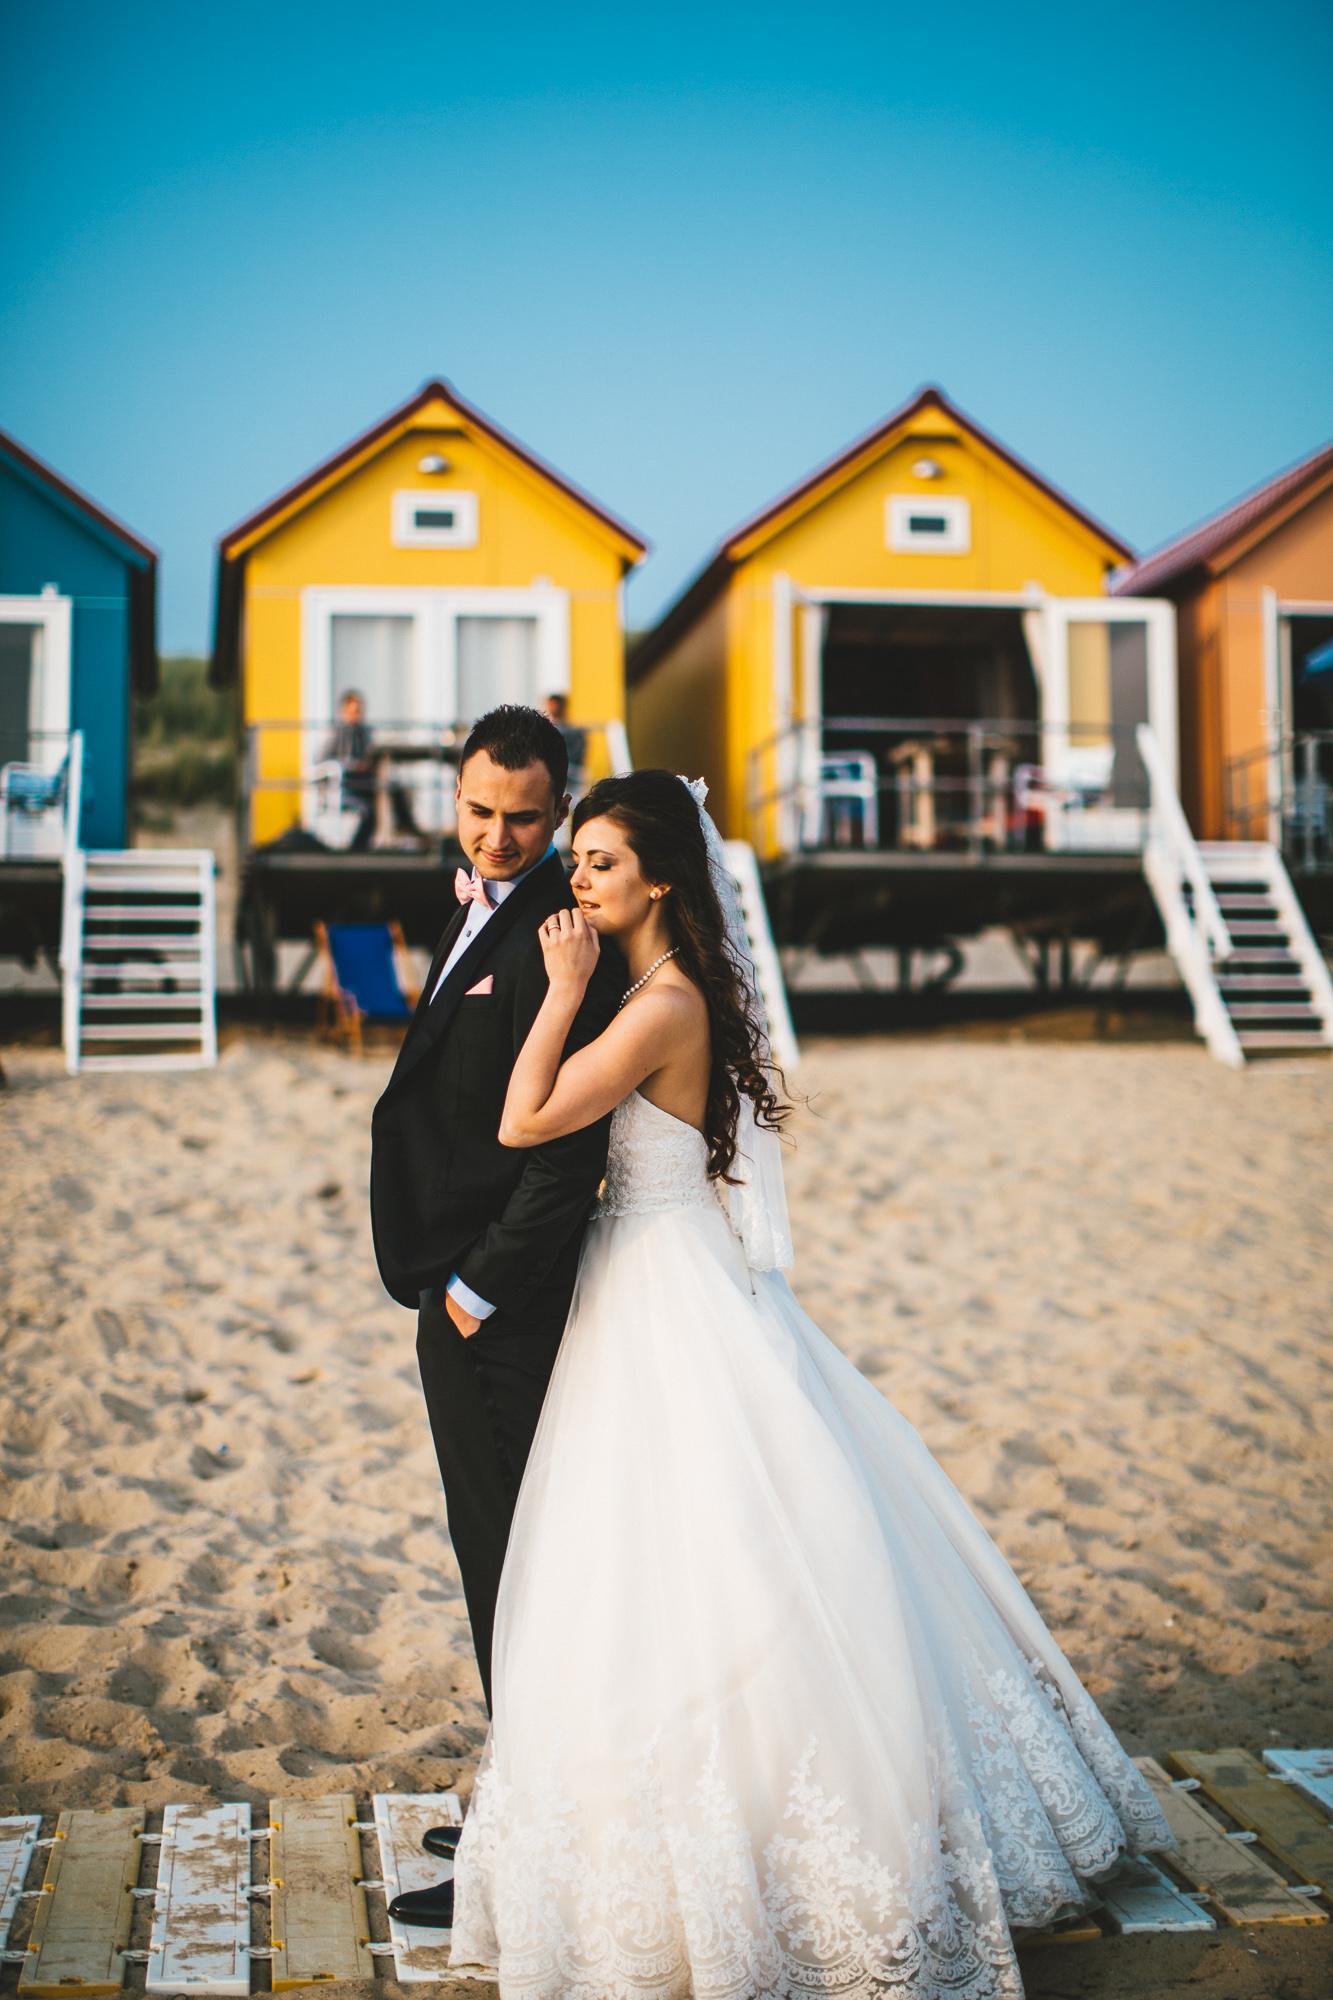 after wedding ia 067 - Afterwedding in Zeeland / Holland